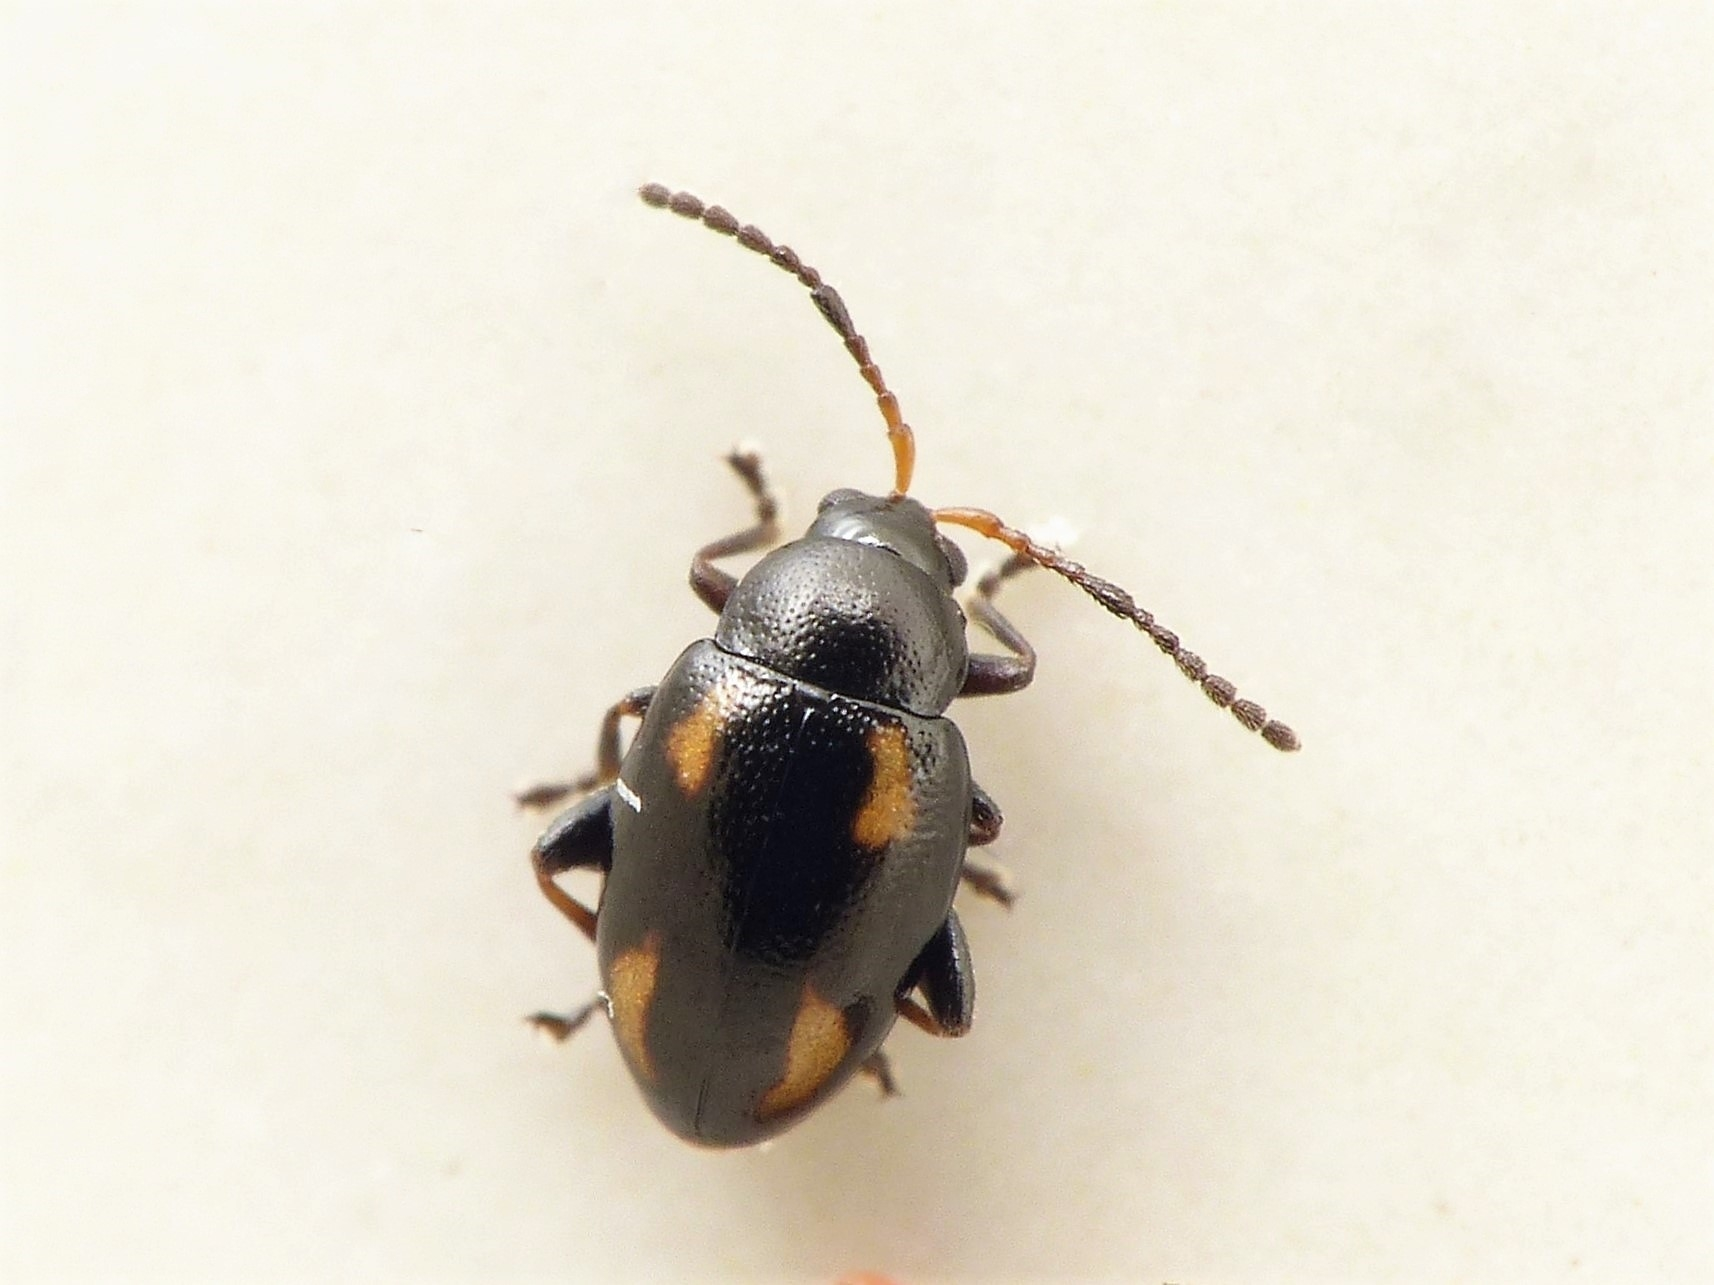 Phyllotreta exclamationis (Phyllotreta exclamationis)